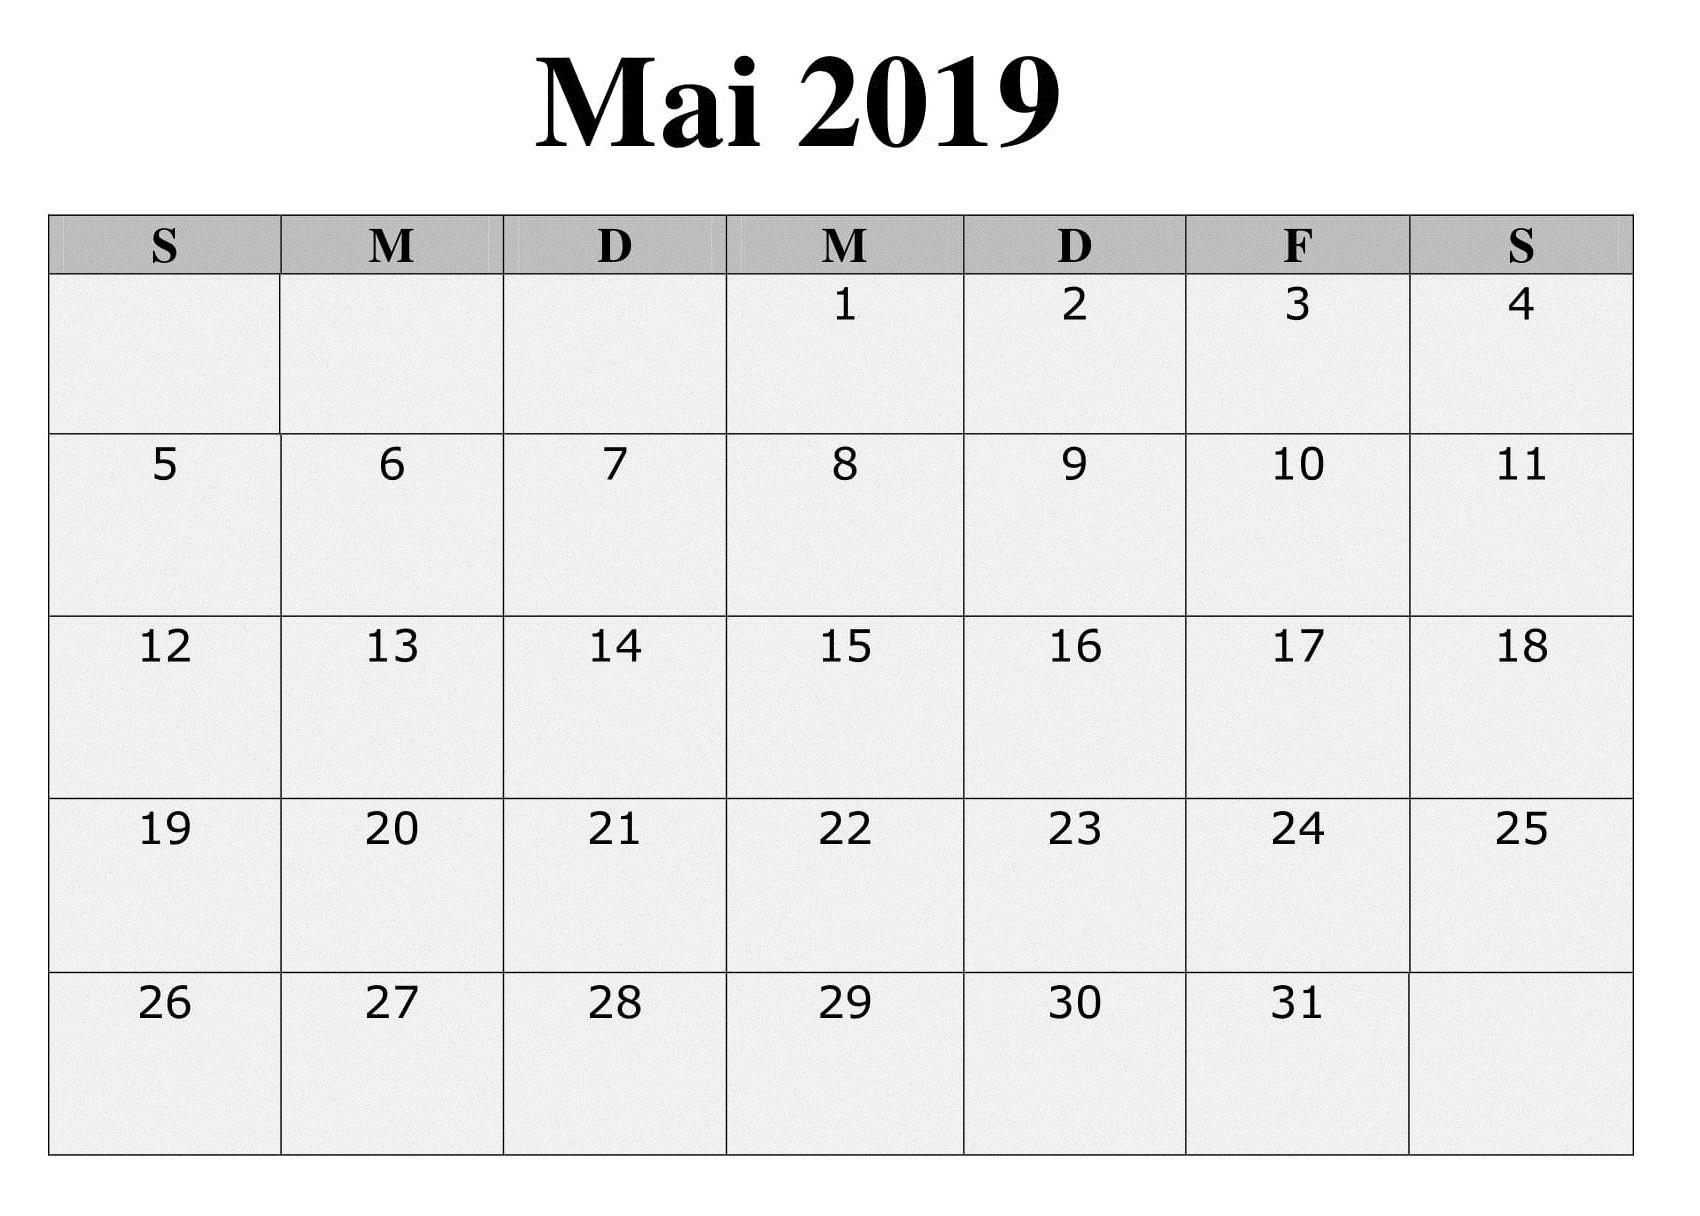 Calendario 2019 Imprimir A4 Más Populares 2019 Kalender Mai Zum Ausdrucken Planer Of Calendario 2019 Imprimir A4 Más Populares Free 2019 Printable Calendar Col